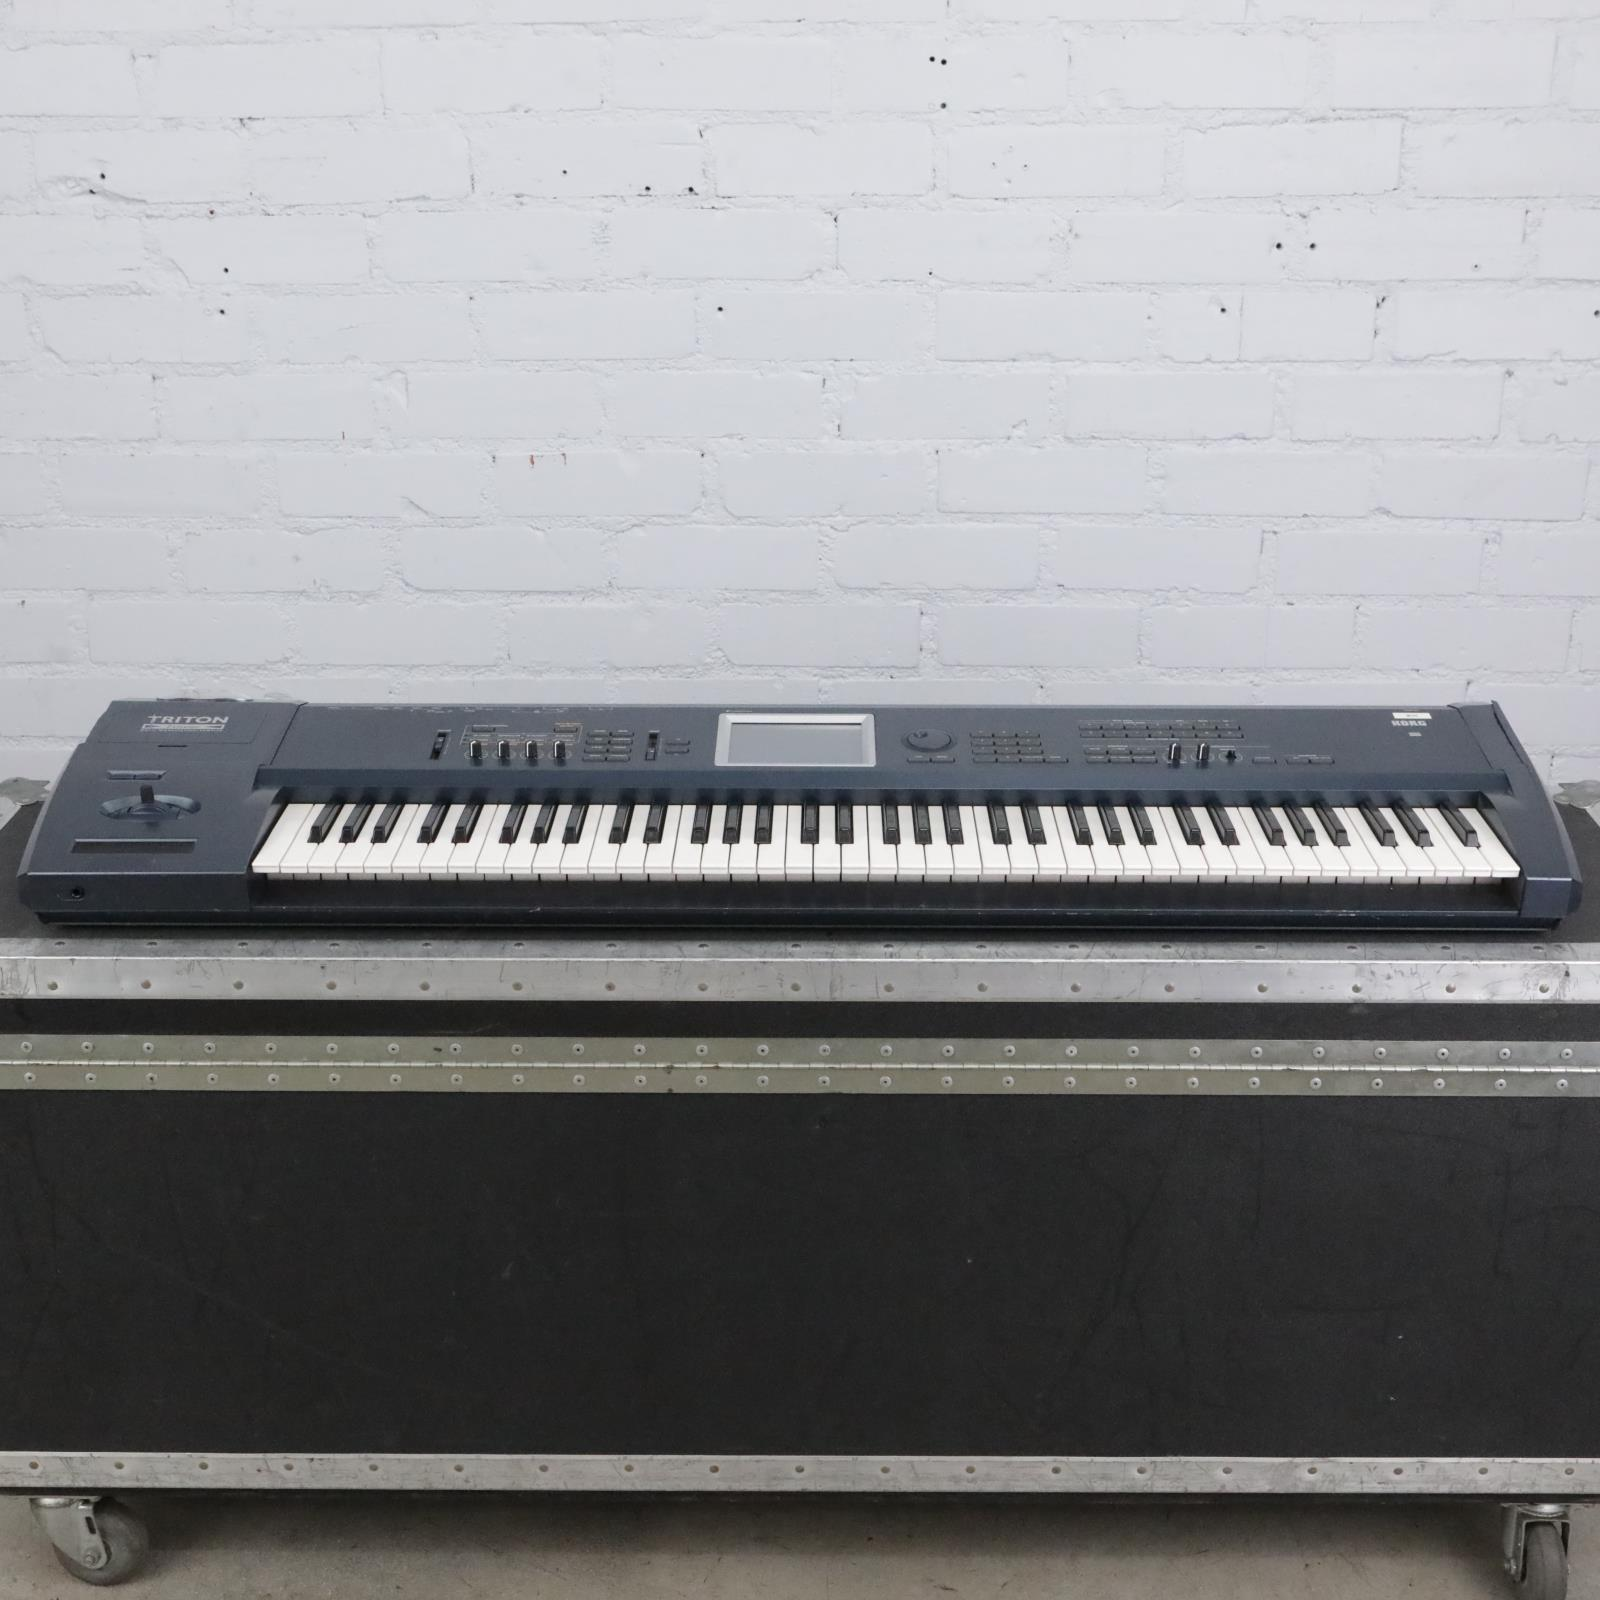 Korg Triton Extreme 76 Workstation / Sampler Keyboard w/ A&S Road Case #41609